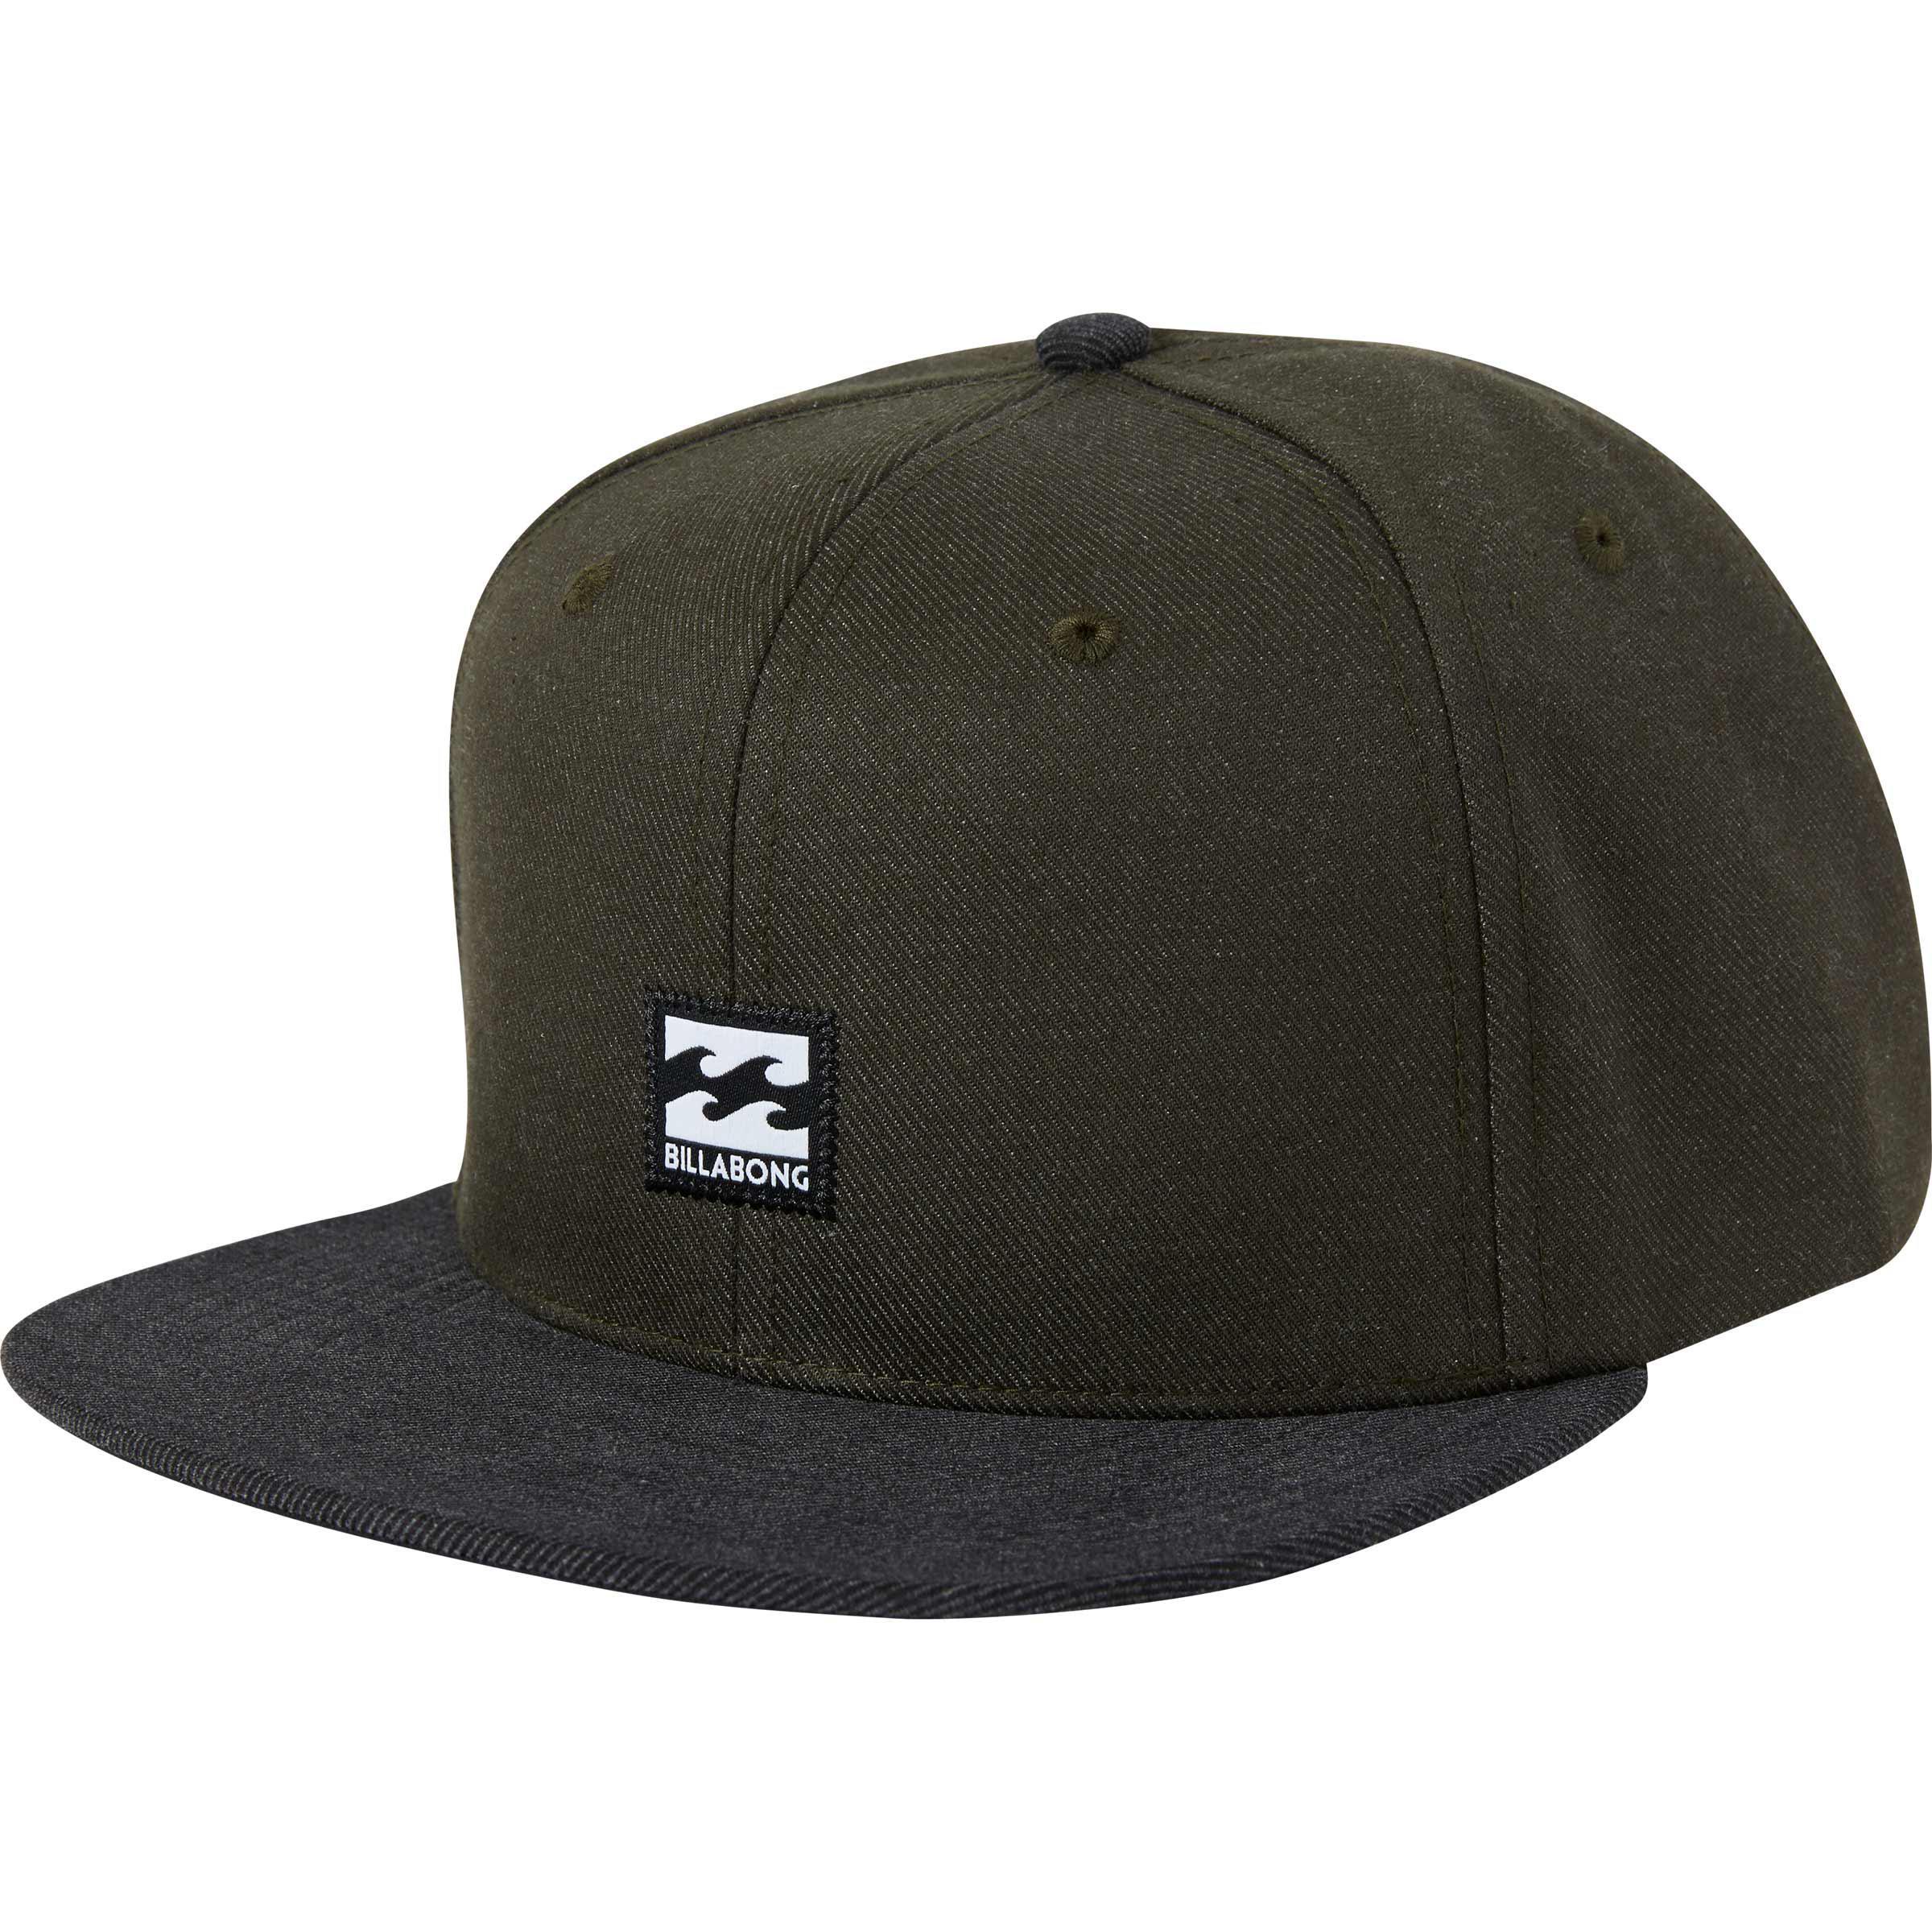 60cb6453db98 Lyst - Billabong Primary Snapback Hat in Green for Men